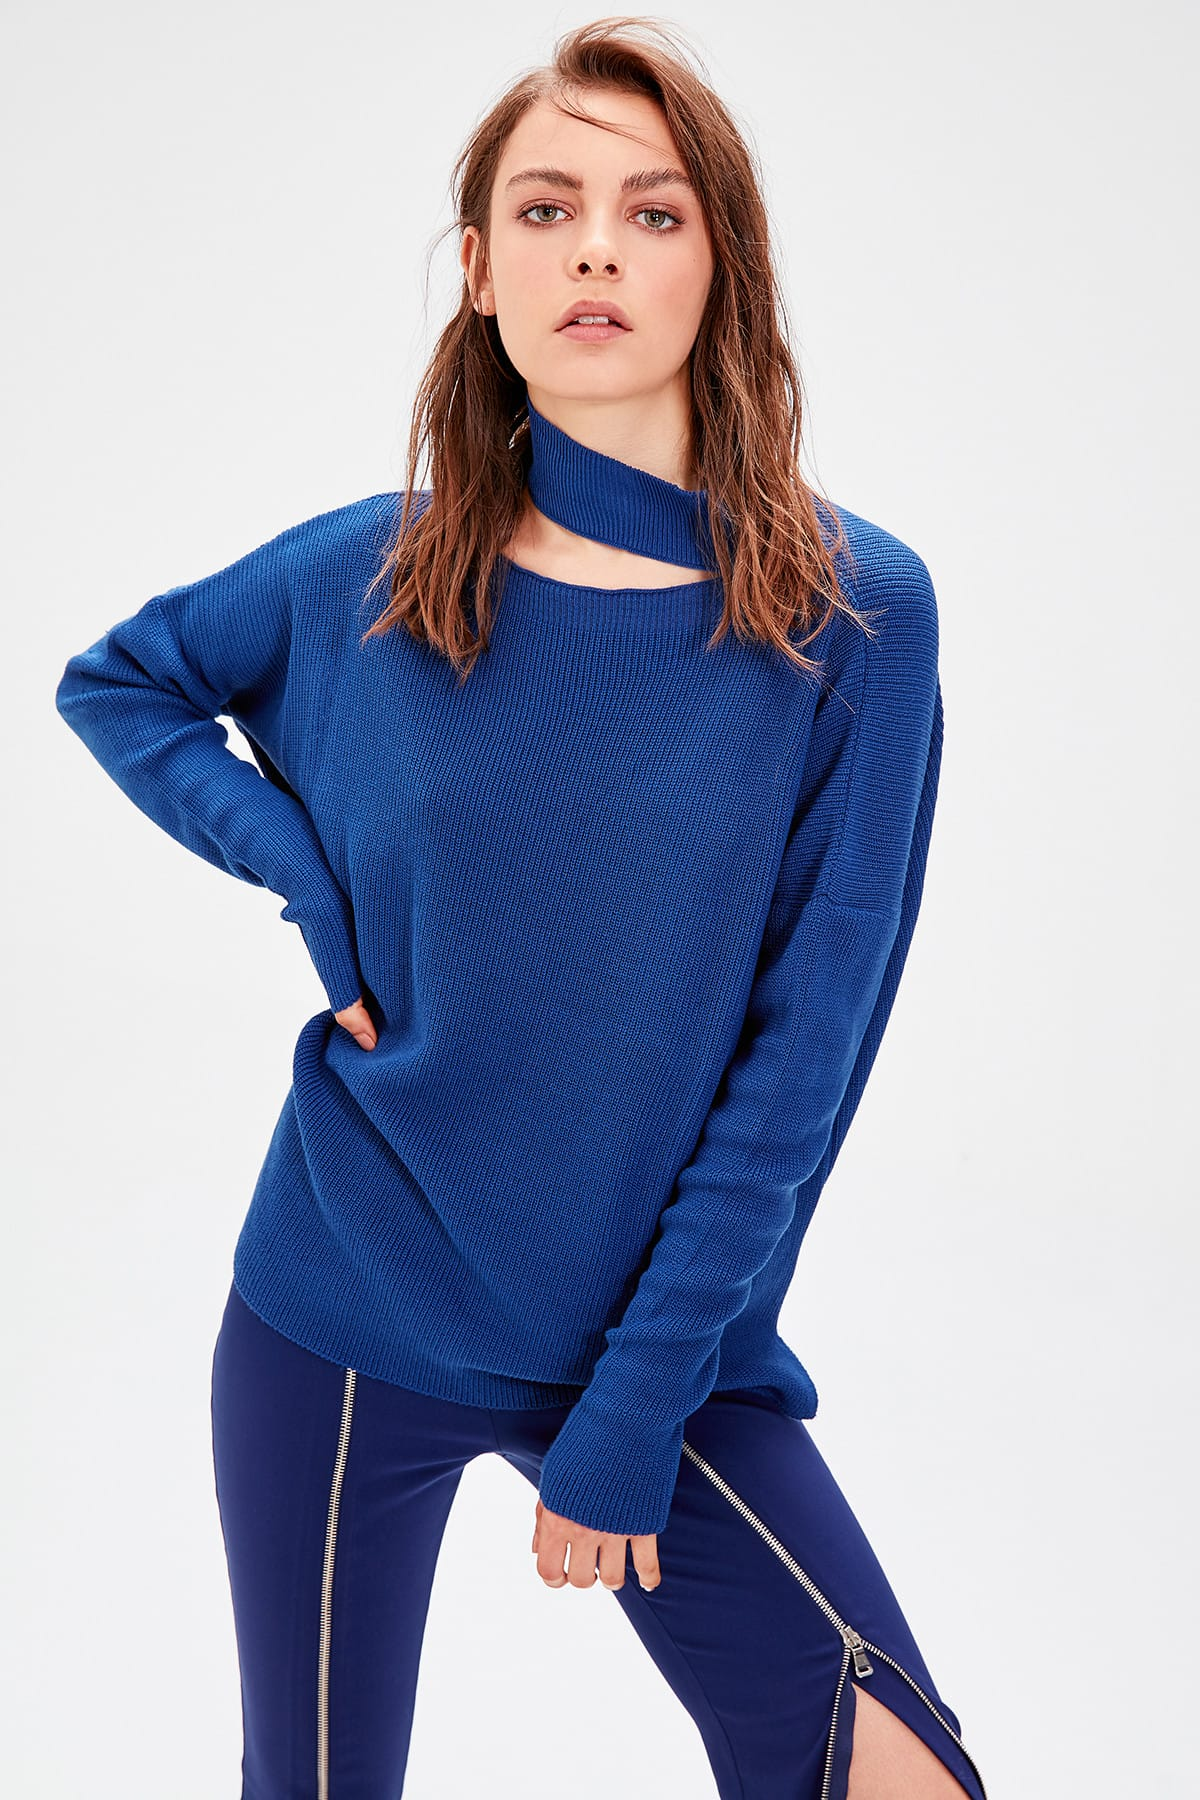 Trendyol índigo detalle de corte suéter de punto TWOAW20KZ0223